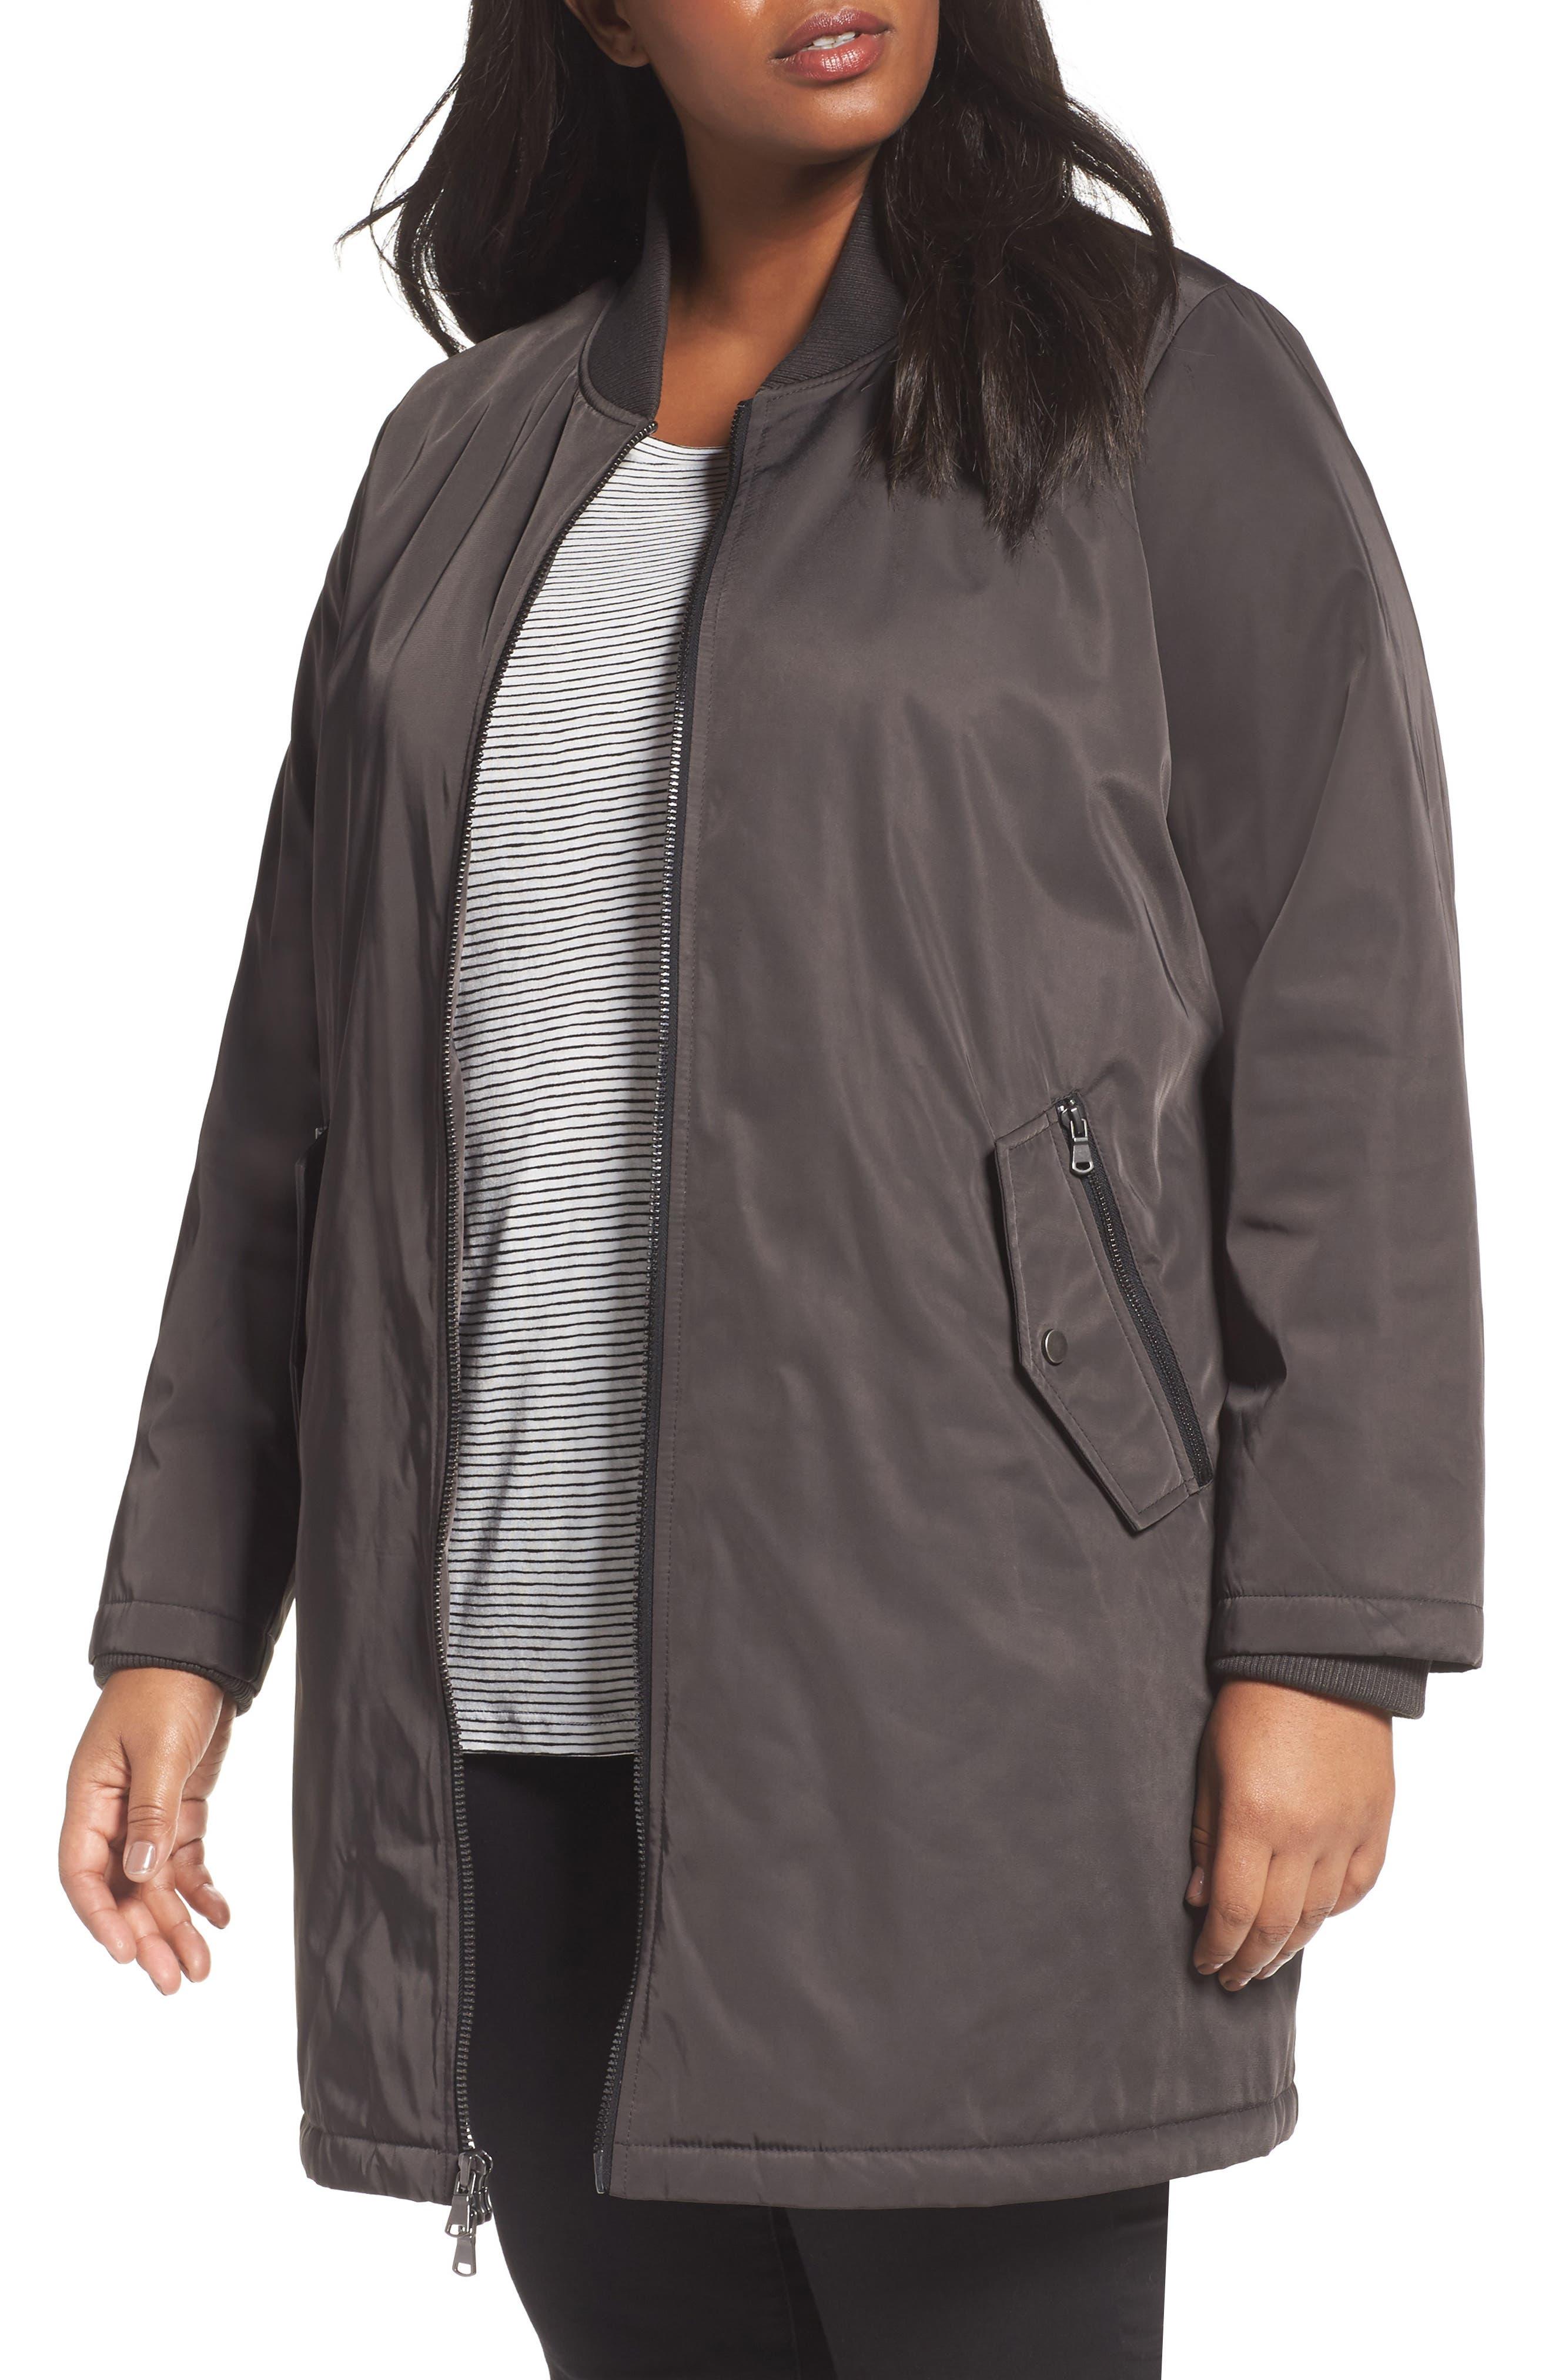 Calson® Long Bomber Jacket (Plus Size)